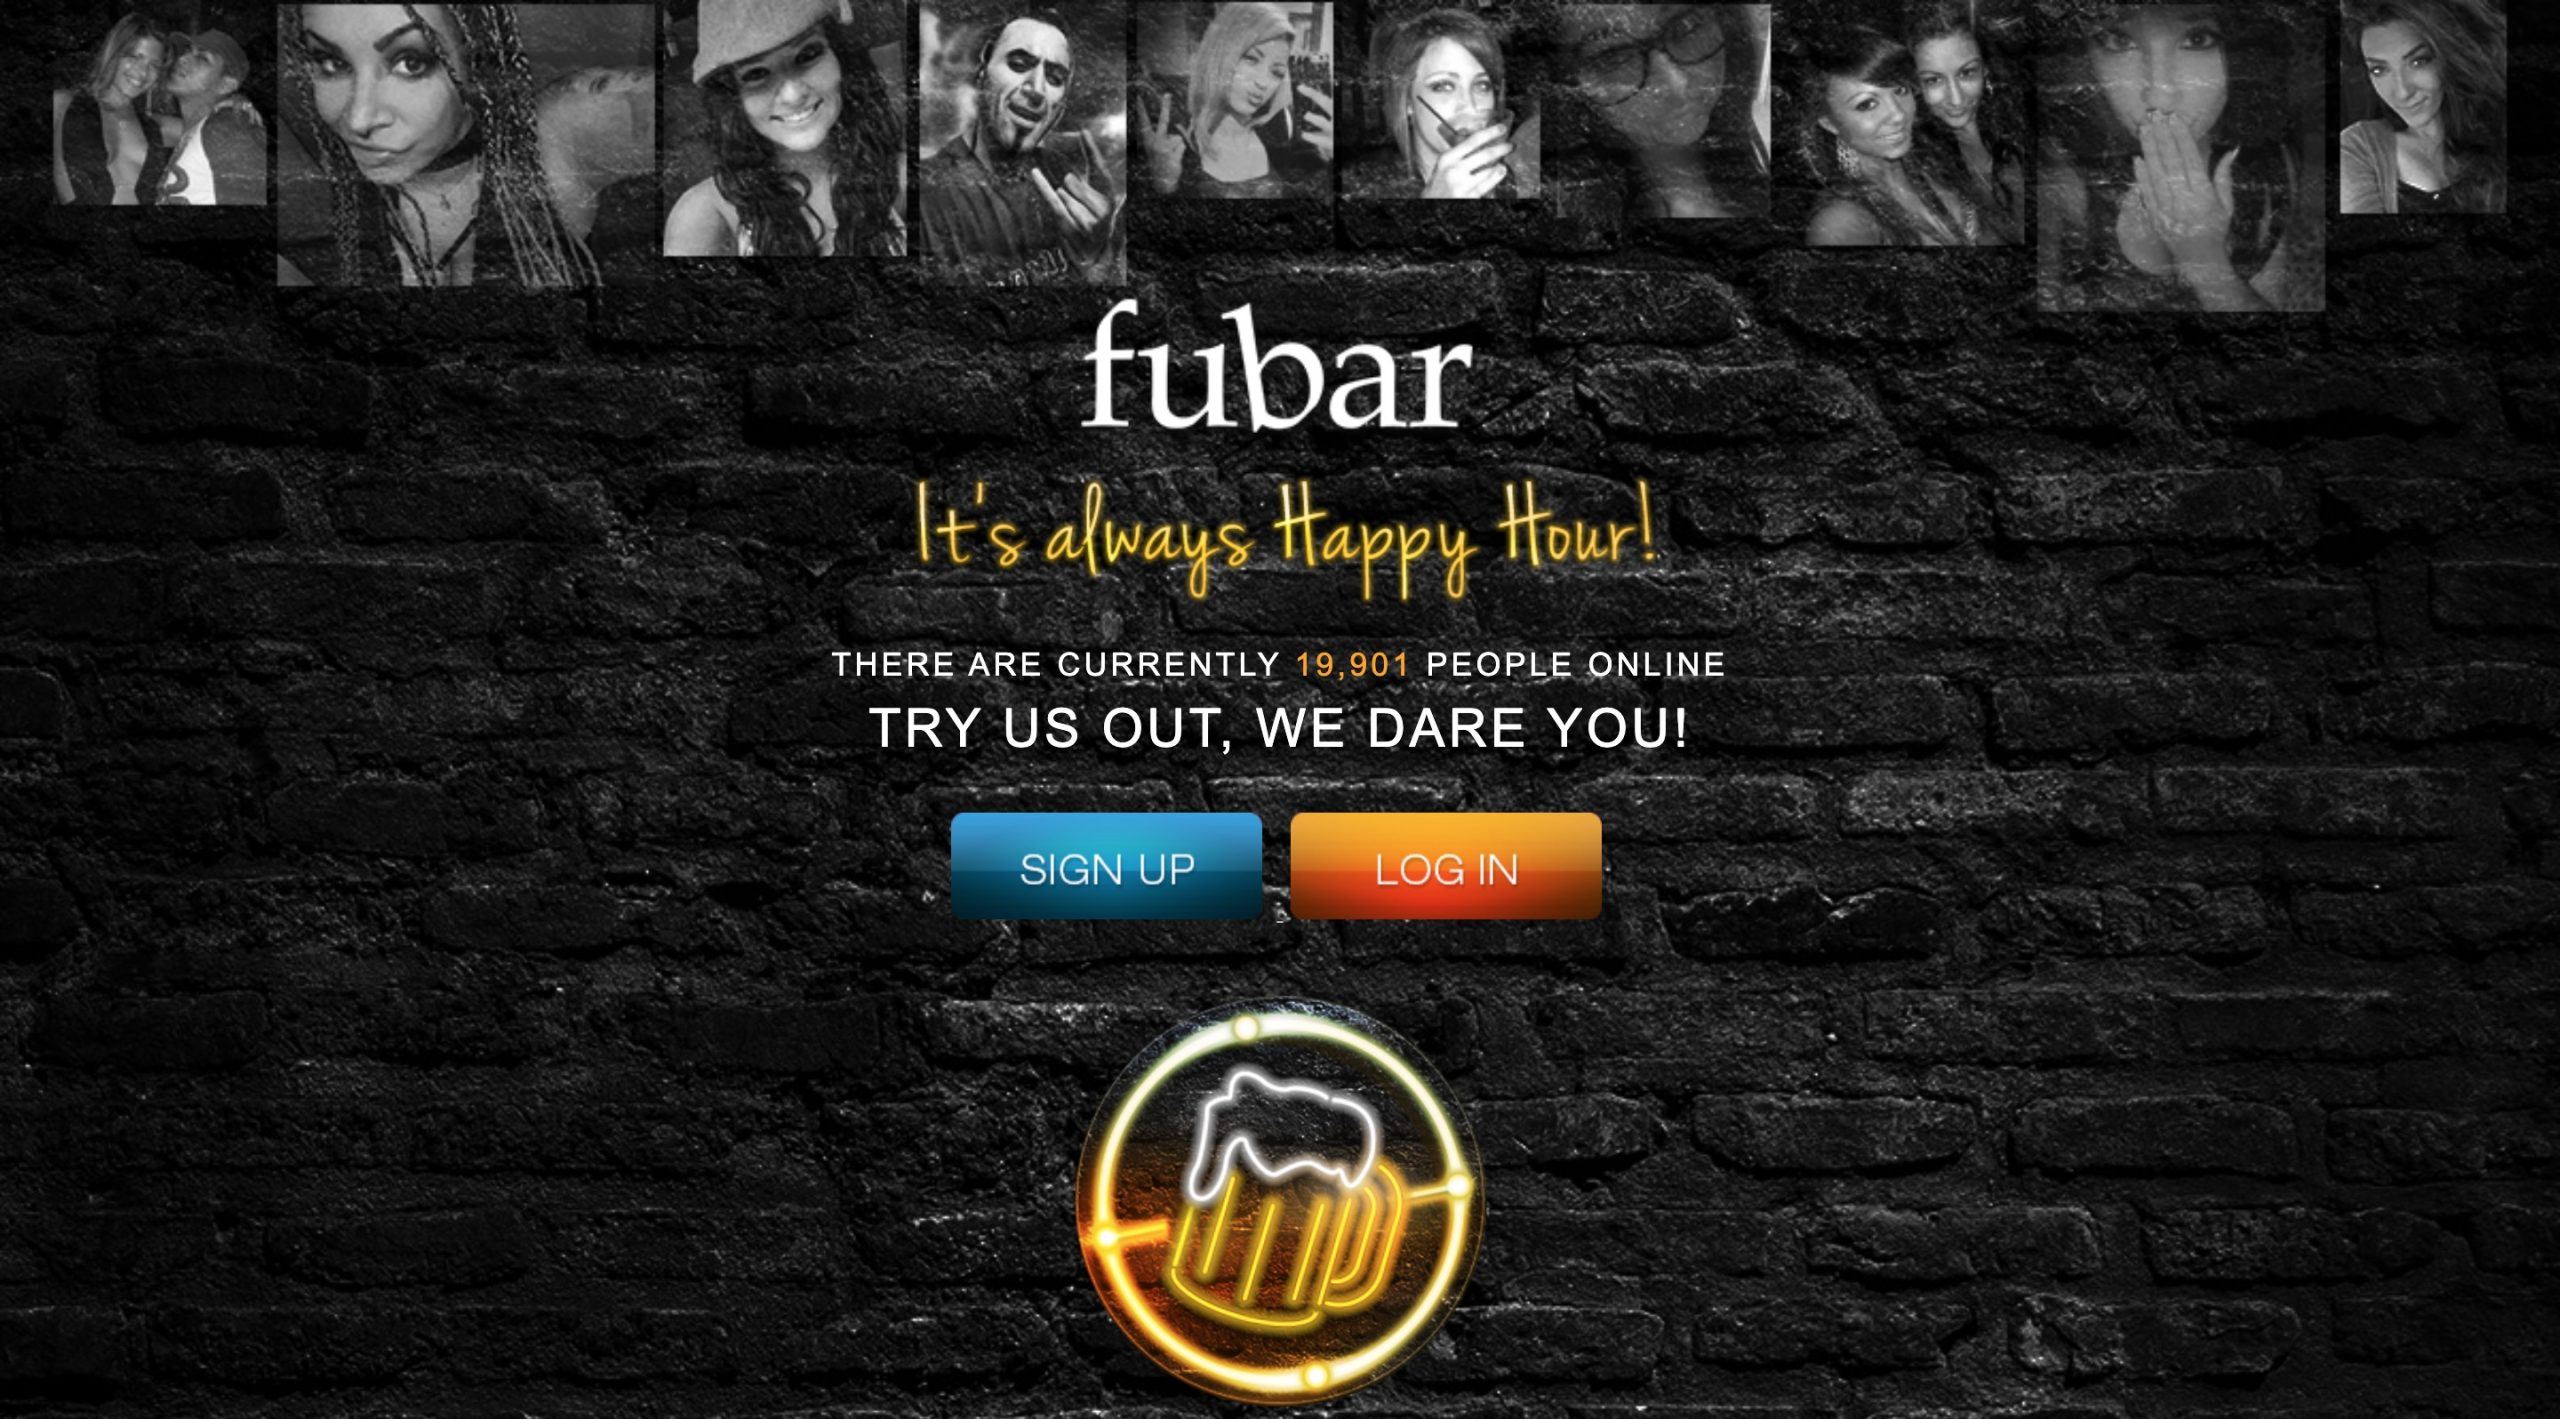 Fubar main page